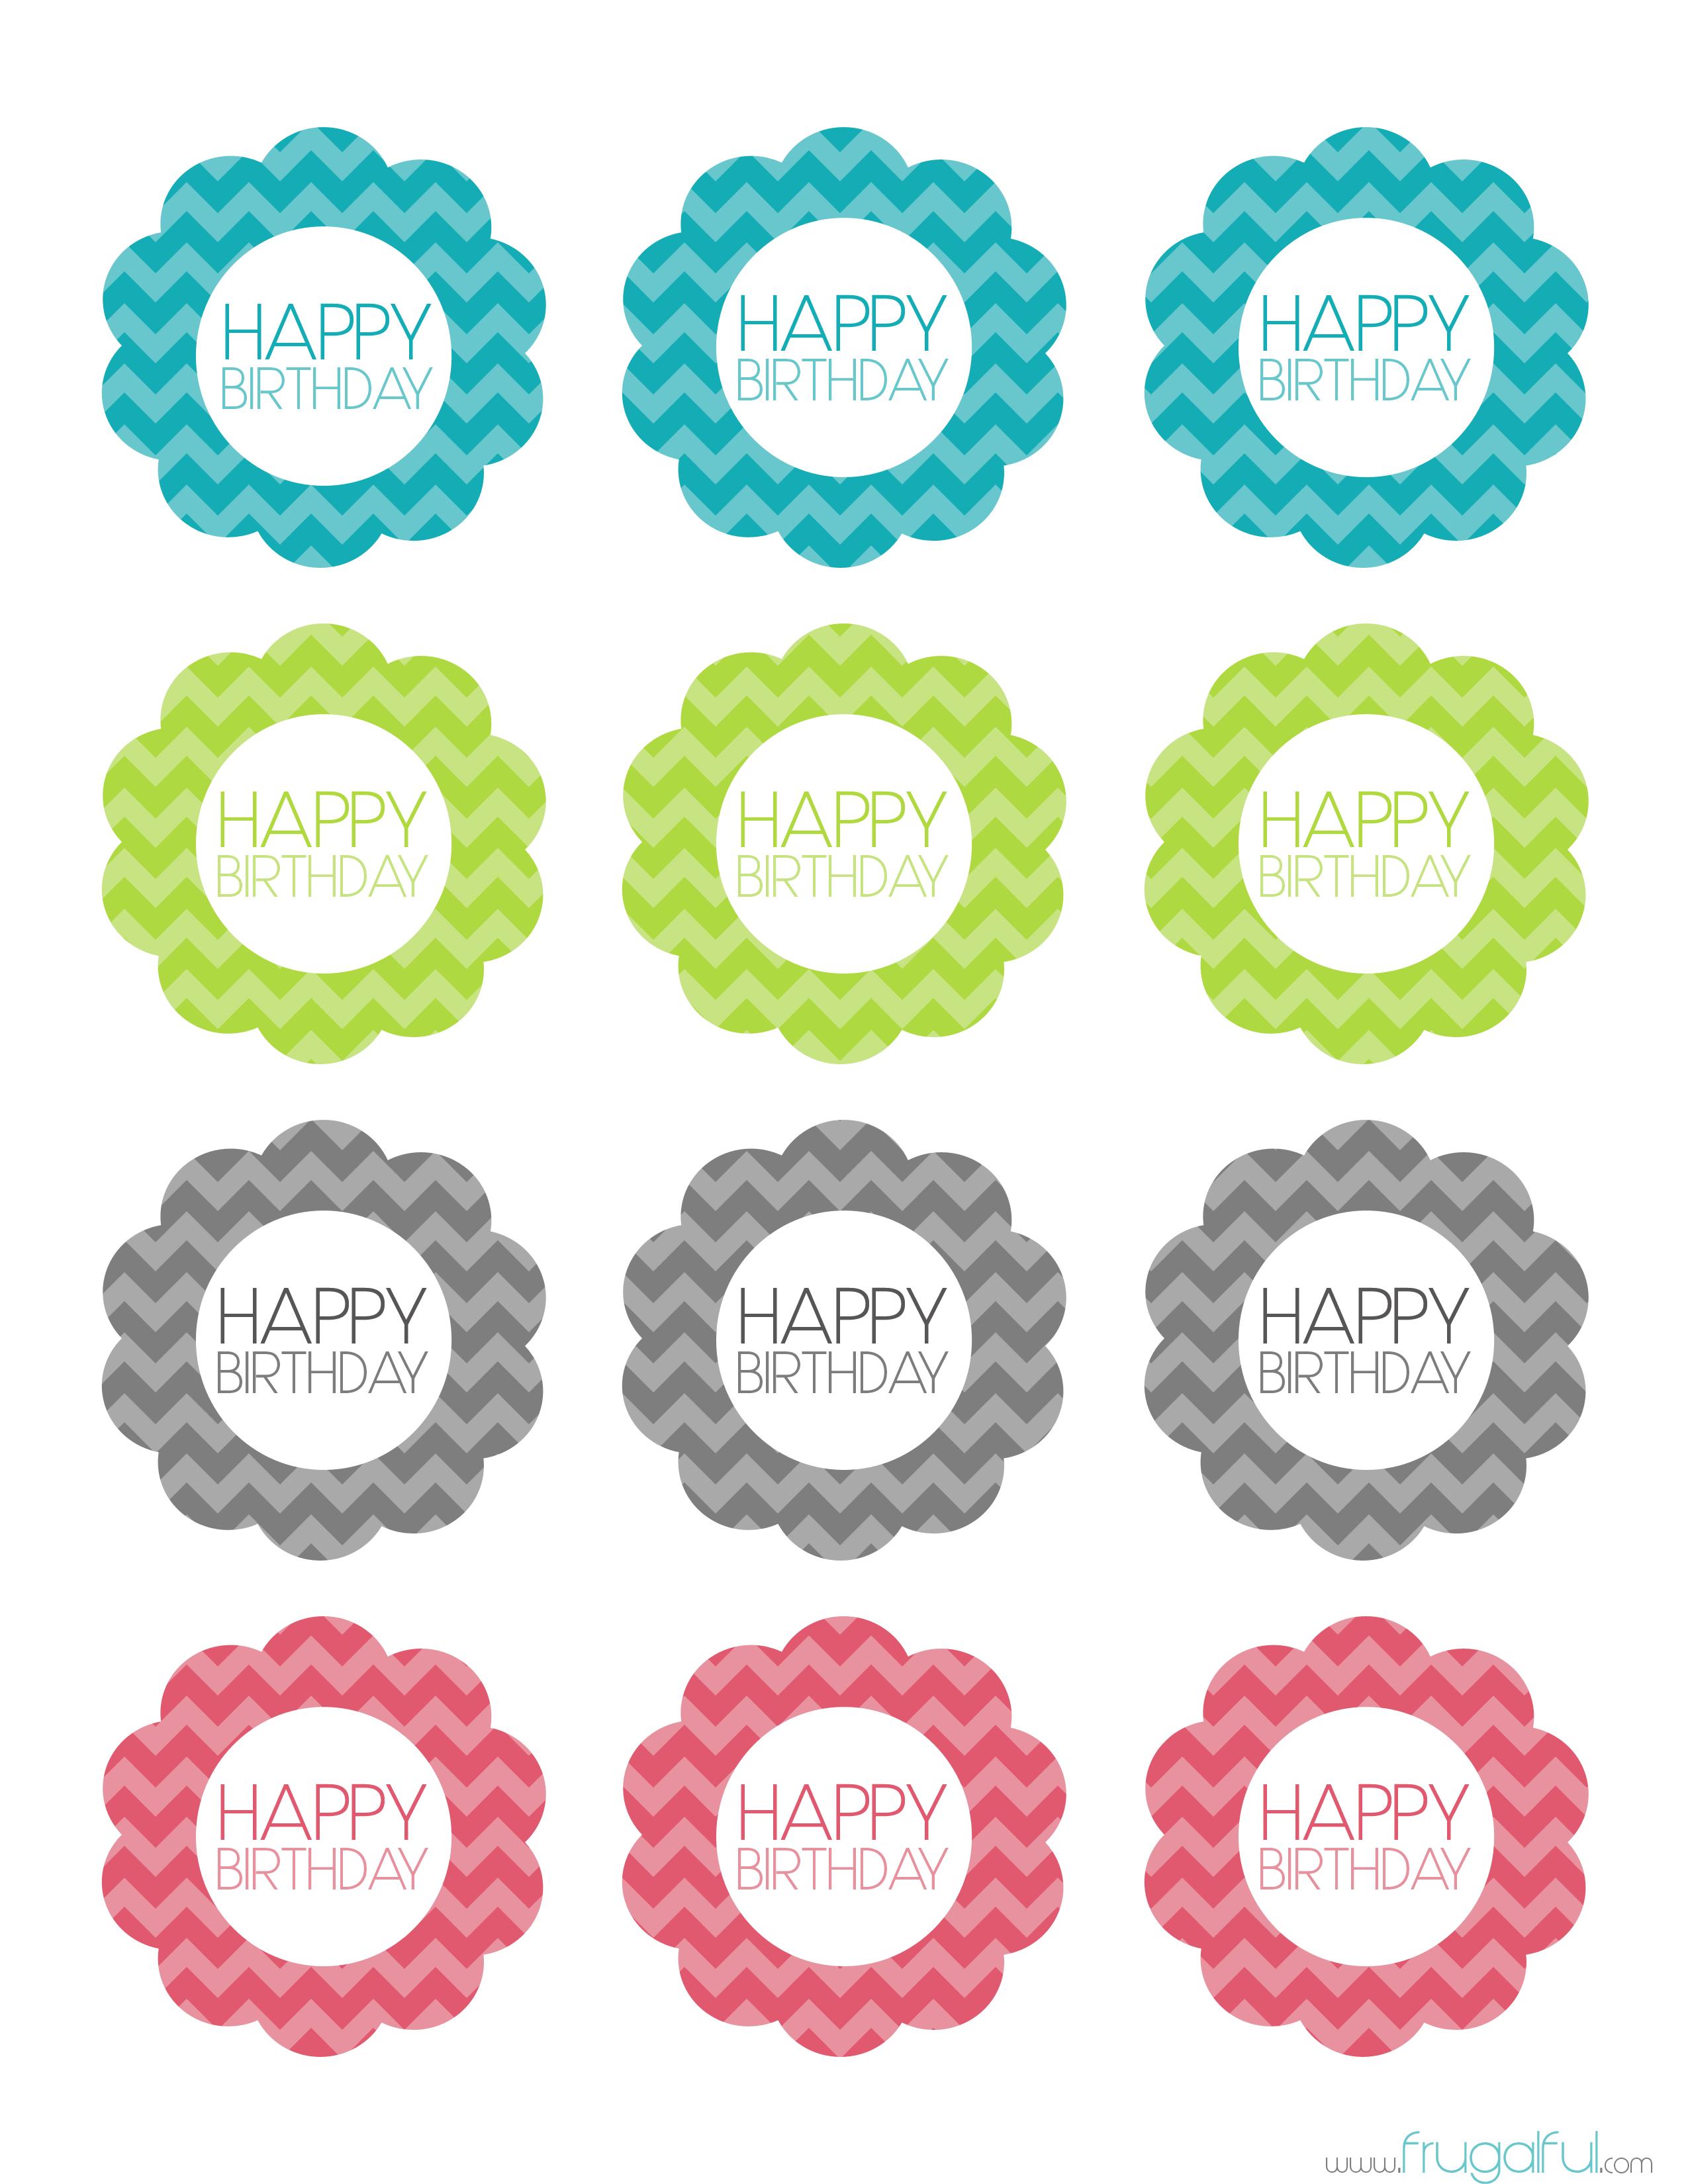 Free Printable Chevron Birthday Cupcake Topper Cakepins - Cupcake Flags Printable Free